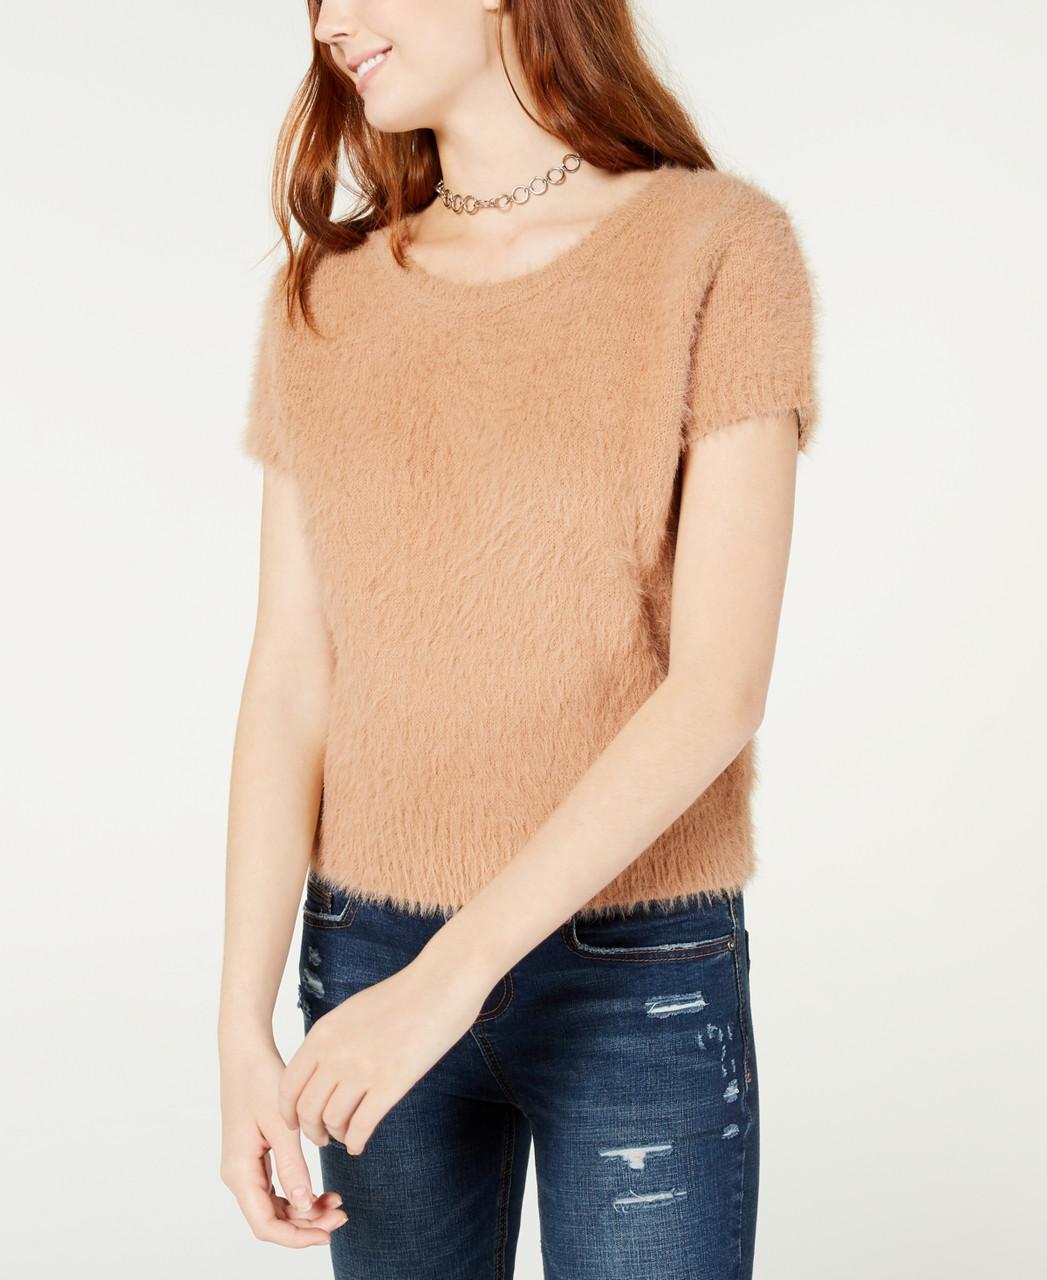 Freshman Женский пуловер- А4